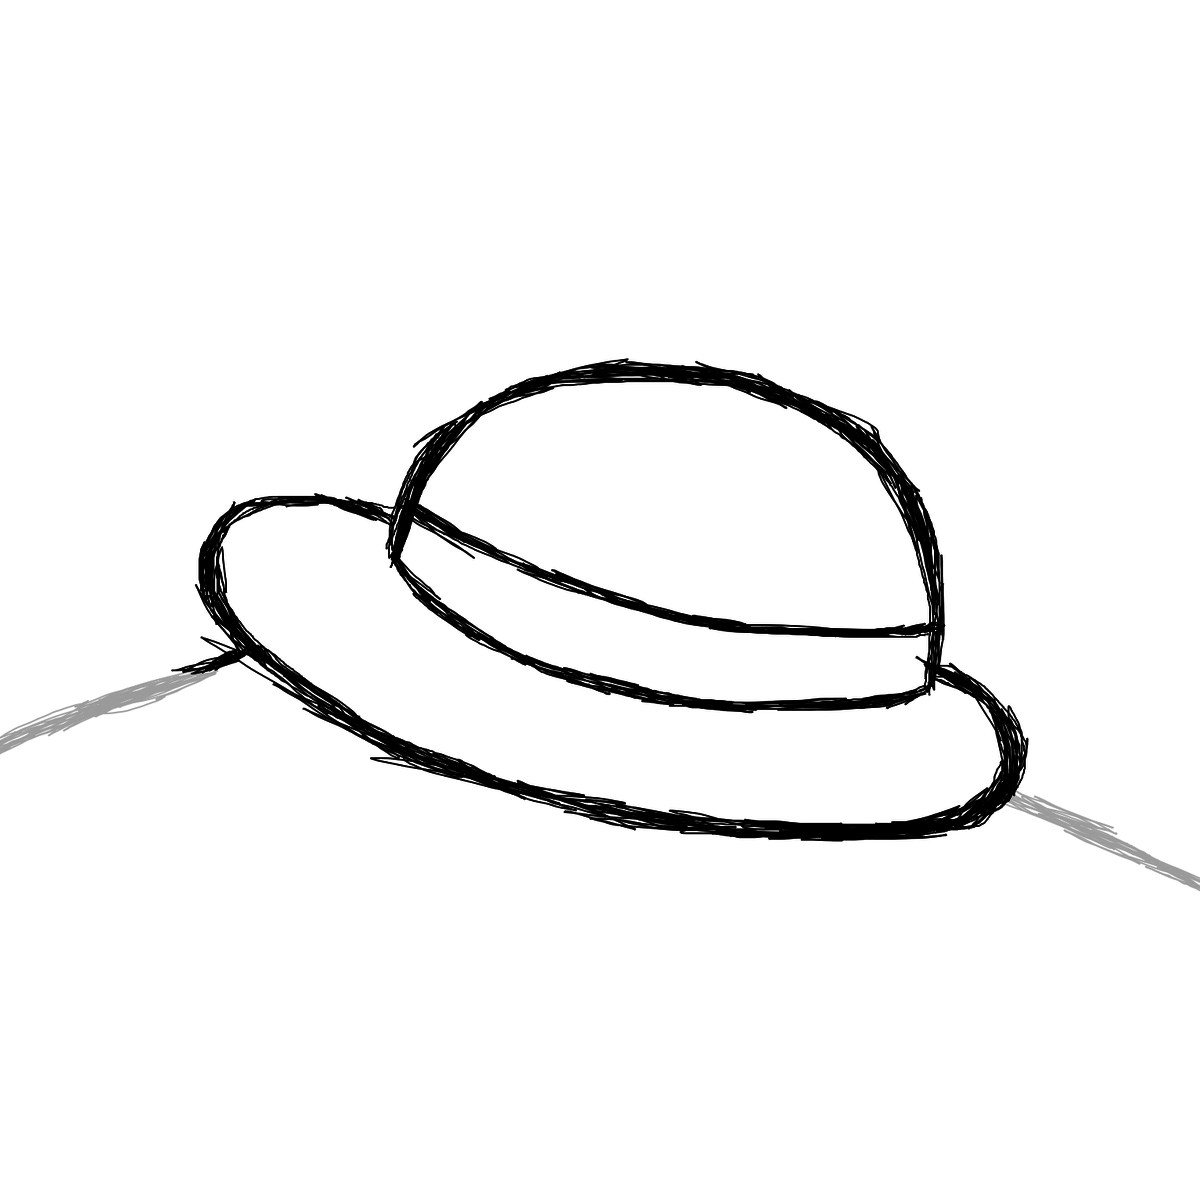 BAAAM drawing#785 lat:44.3512115478515600lng: -4.6807413101196290